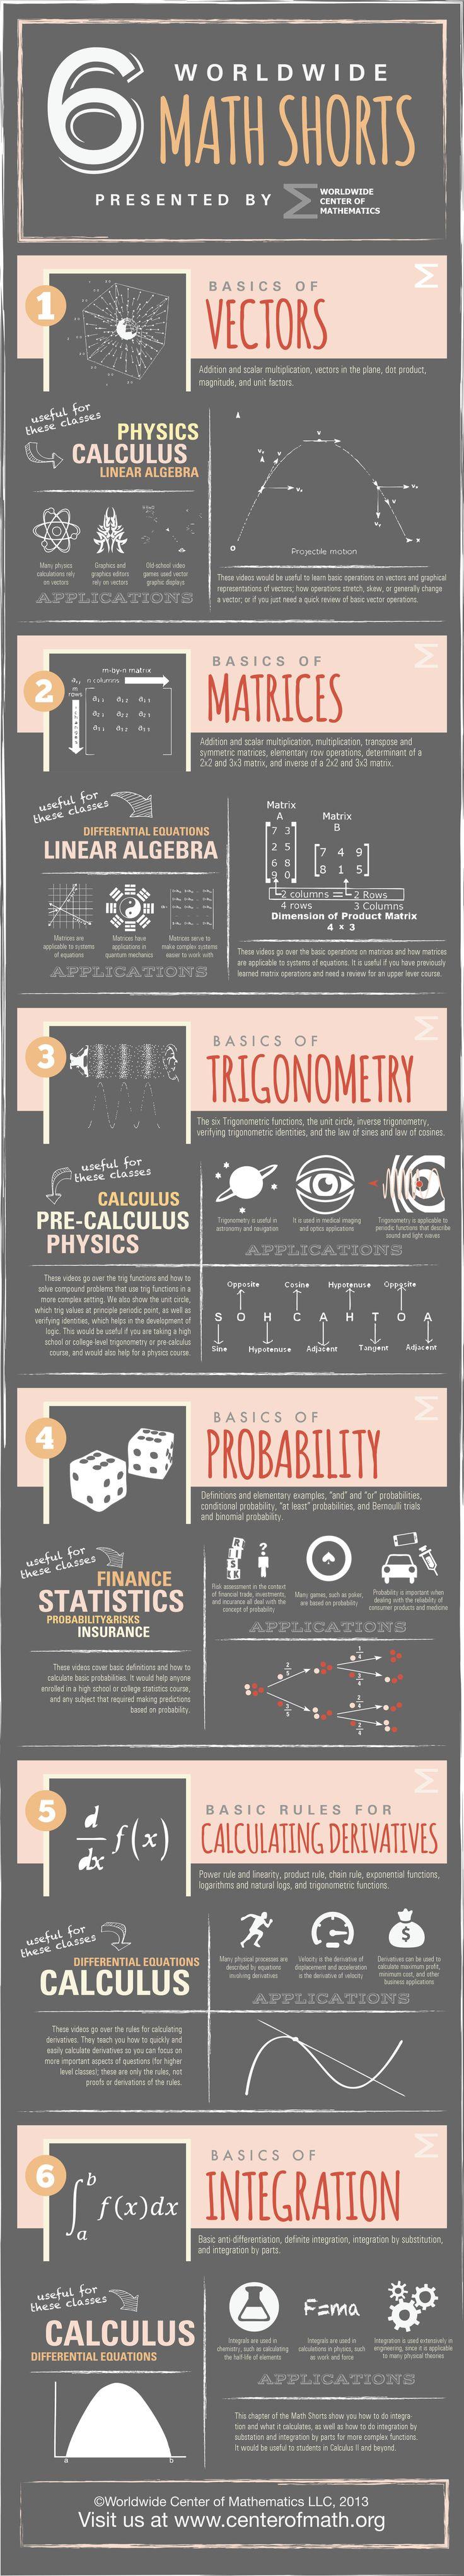 6 Worldwide Math Shorts (Infograph)